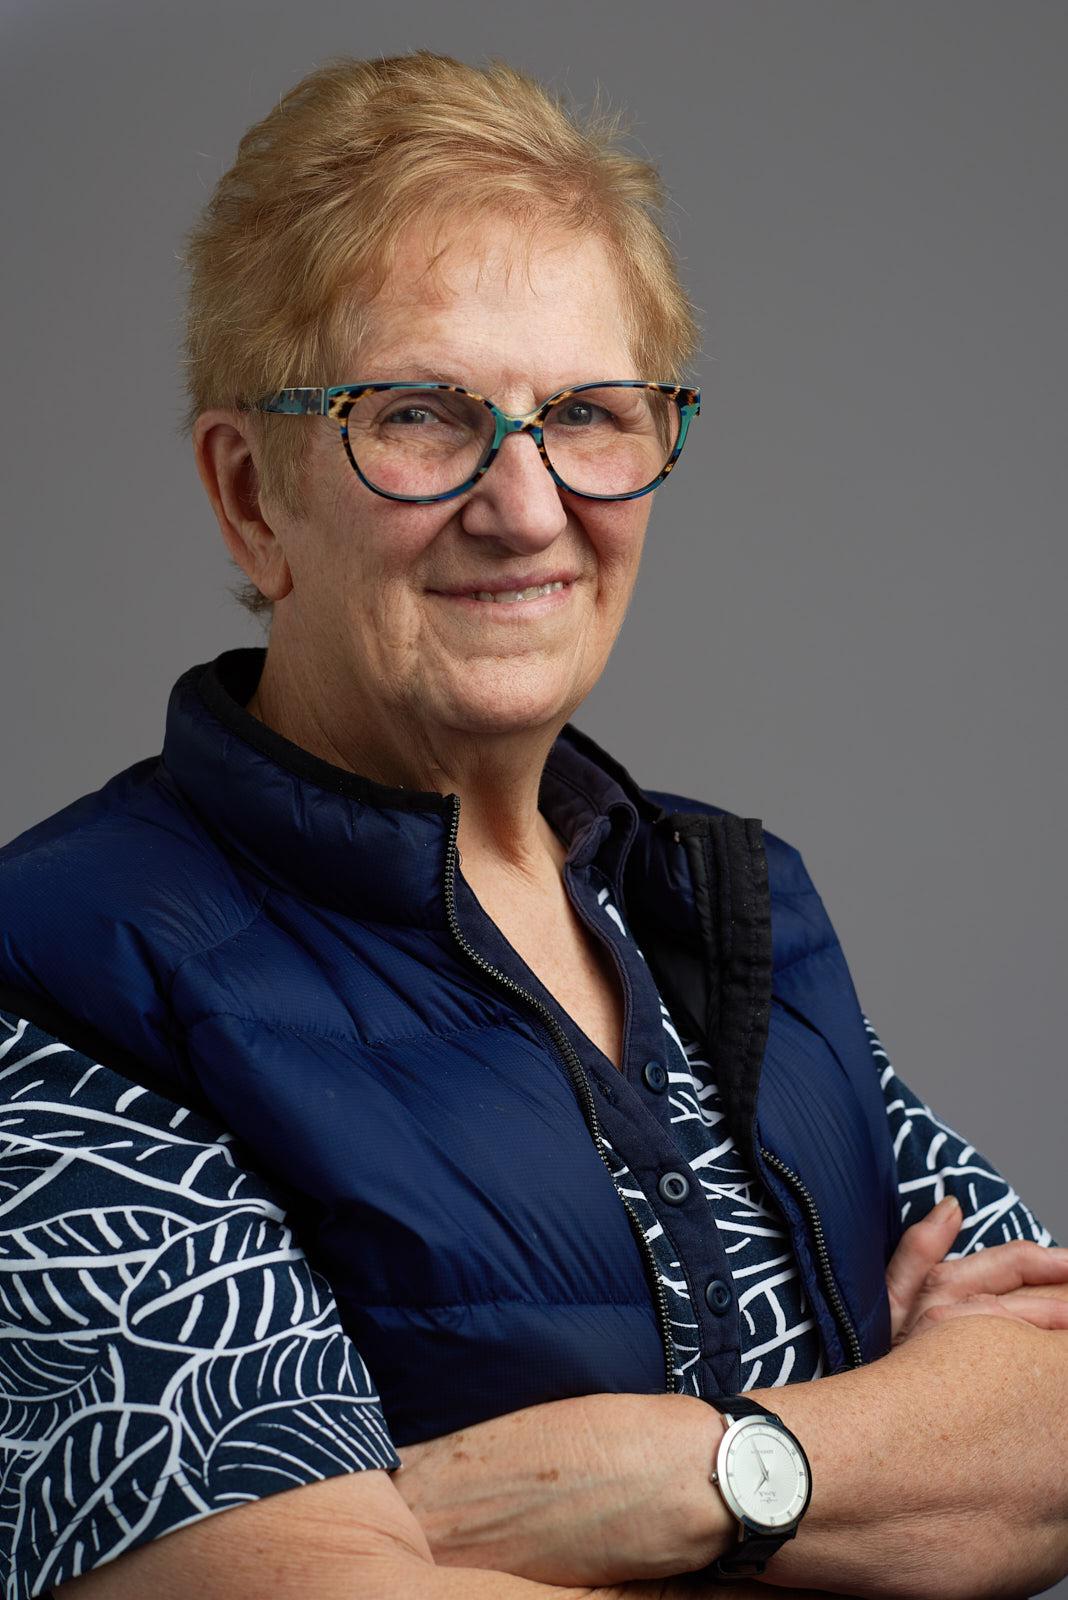 Maureen: Hairdresser, Market Gardener, Licensed Grocer, General Store, Post Office, Newsagent.